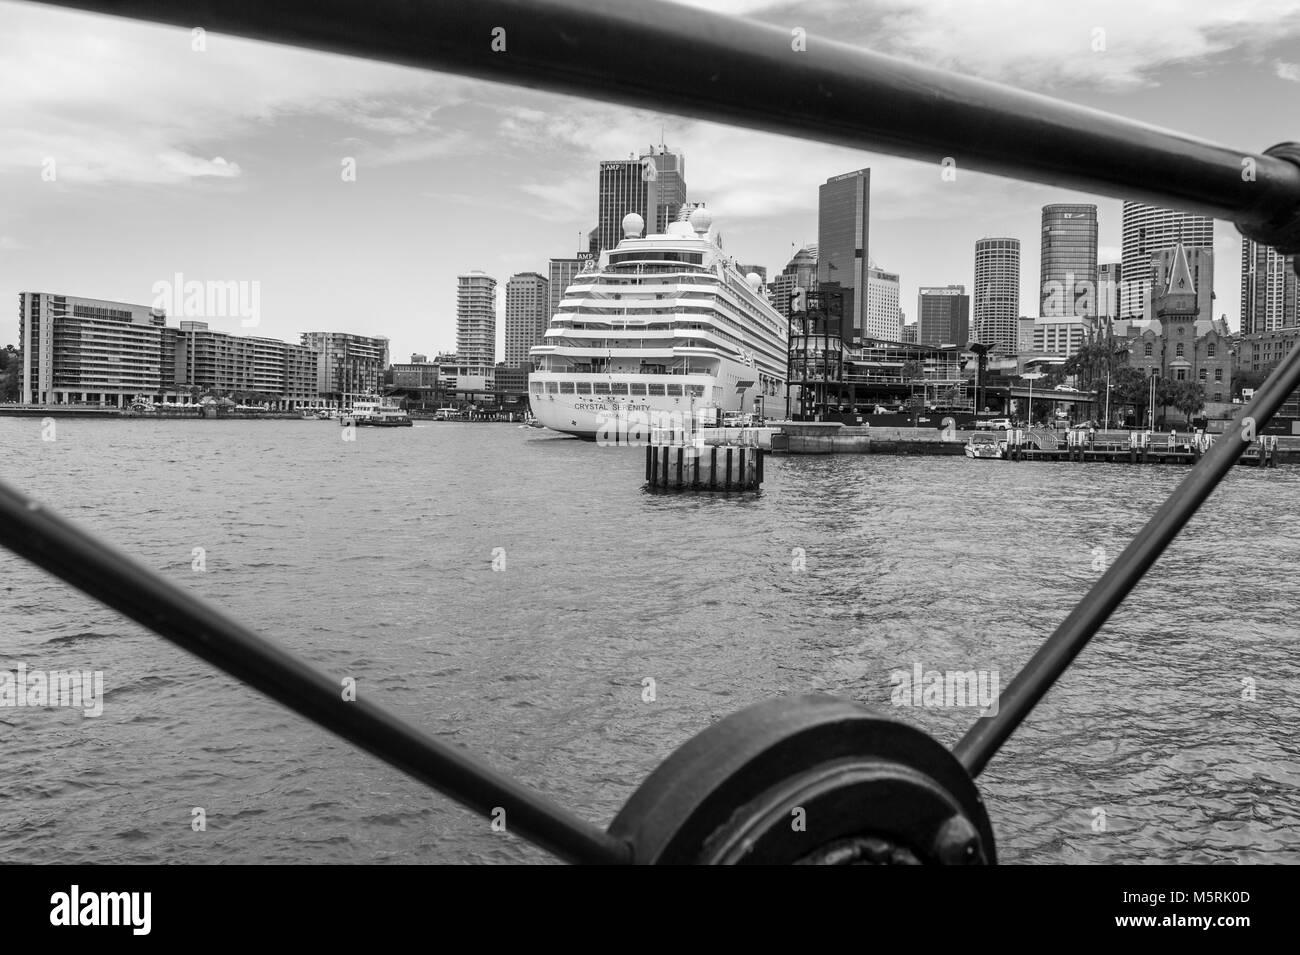 Monochrome view of cruise ship Crystal Serenity, Sydney's Overseas Passenger Terminal, Circular Quay and CBD - Stock Image